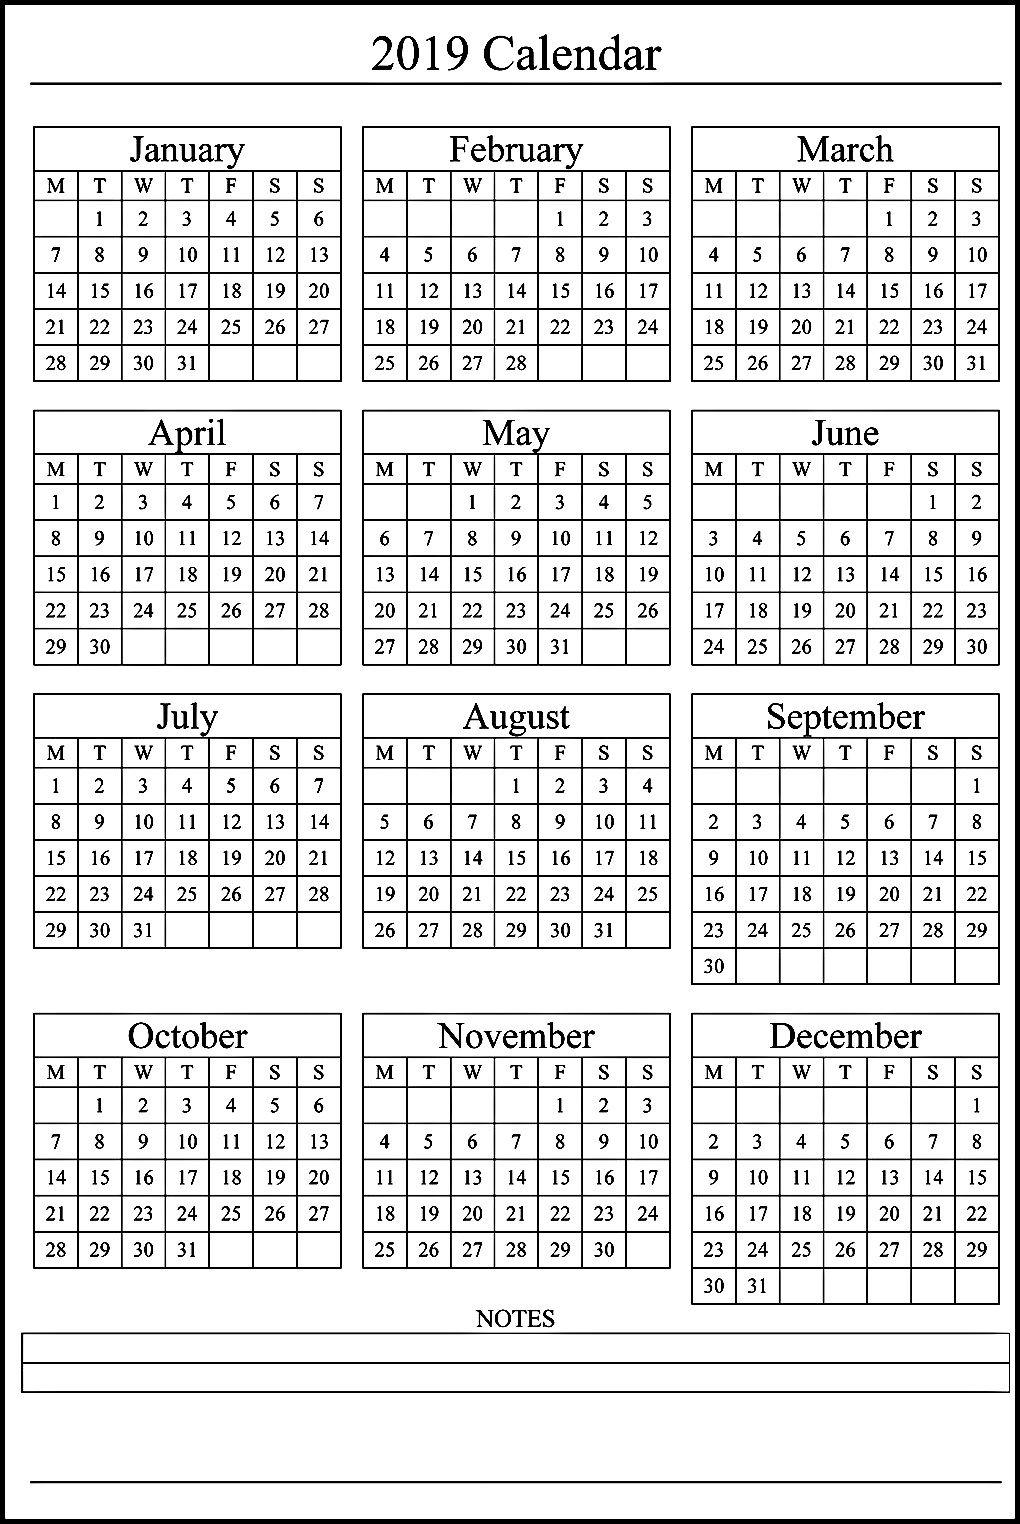 12 Month Calendar On One Page #2019Calendar #holidayscalendar throughout 12 Month Calendar On One Page